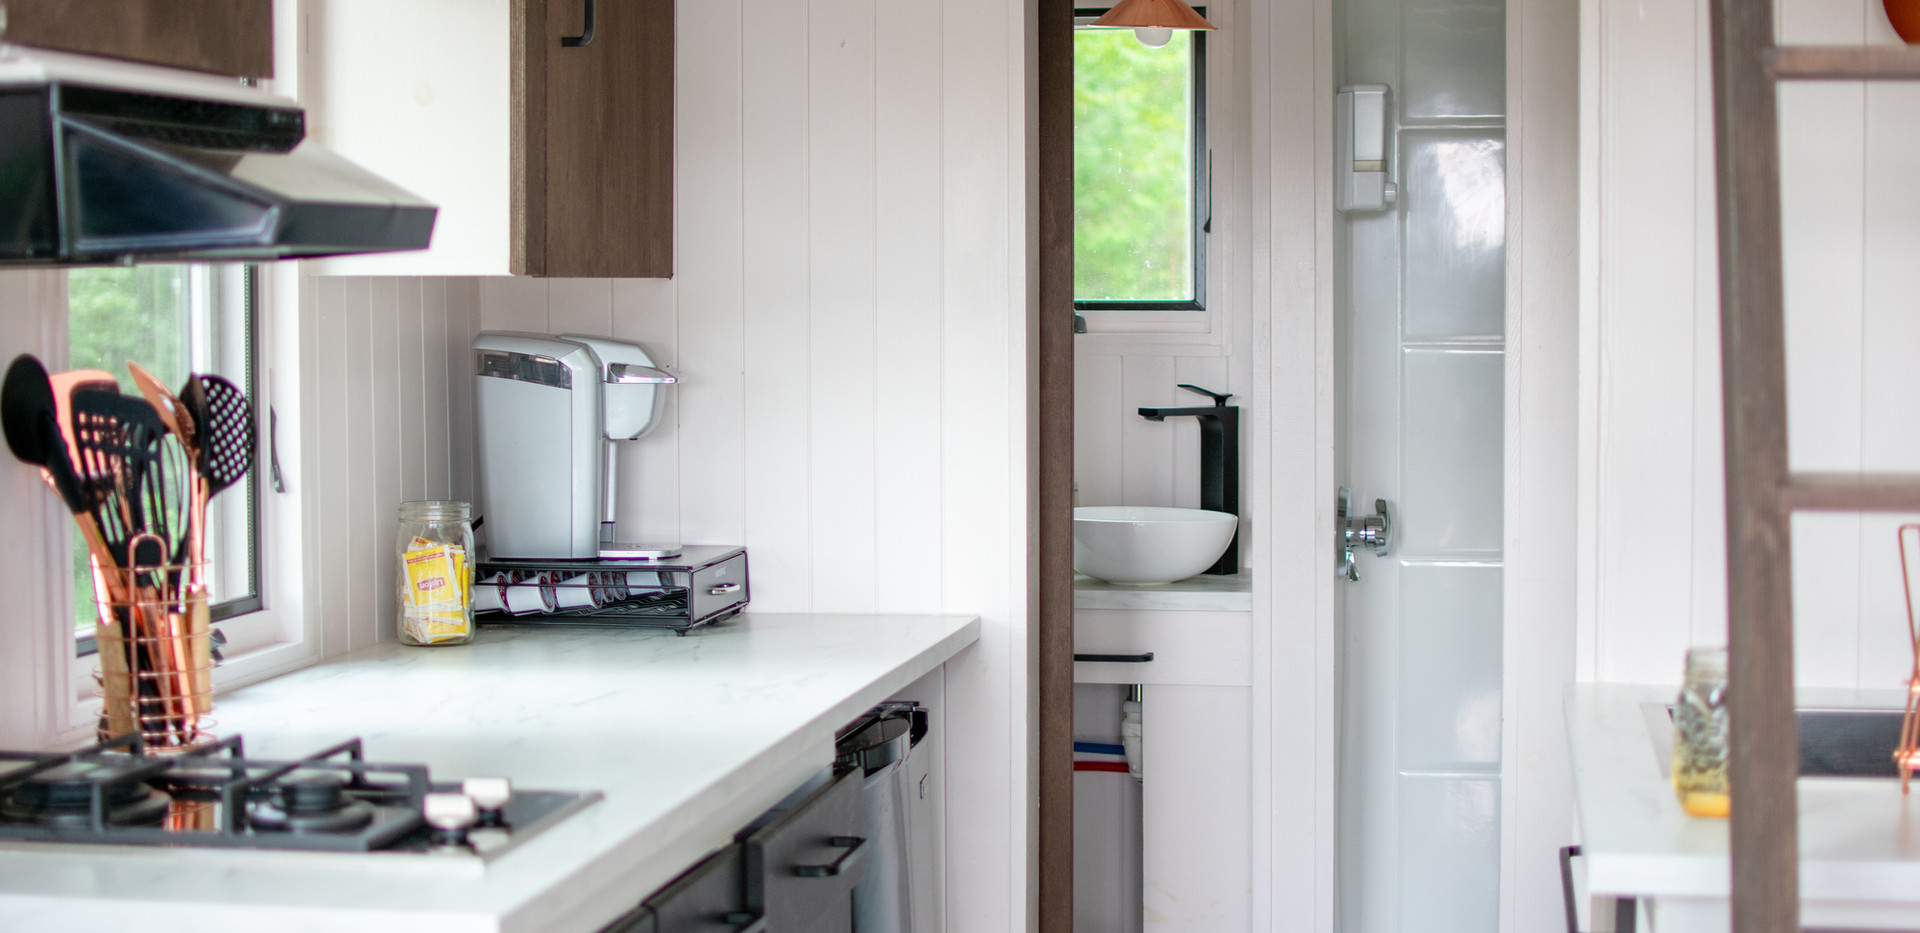 Kitchen Renovation in london